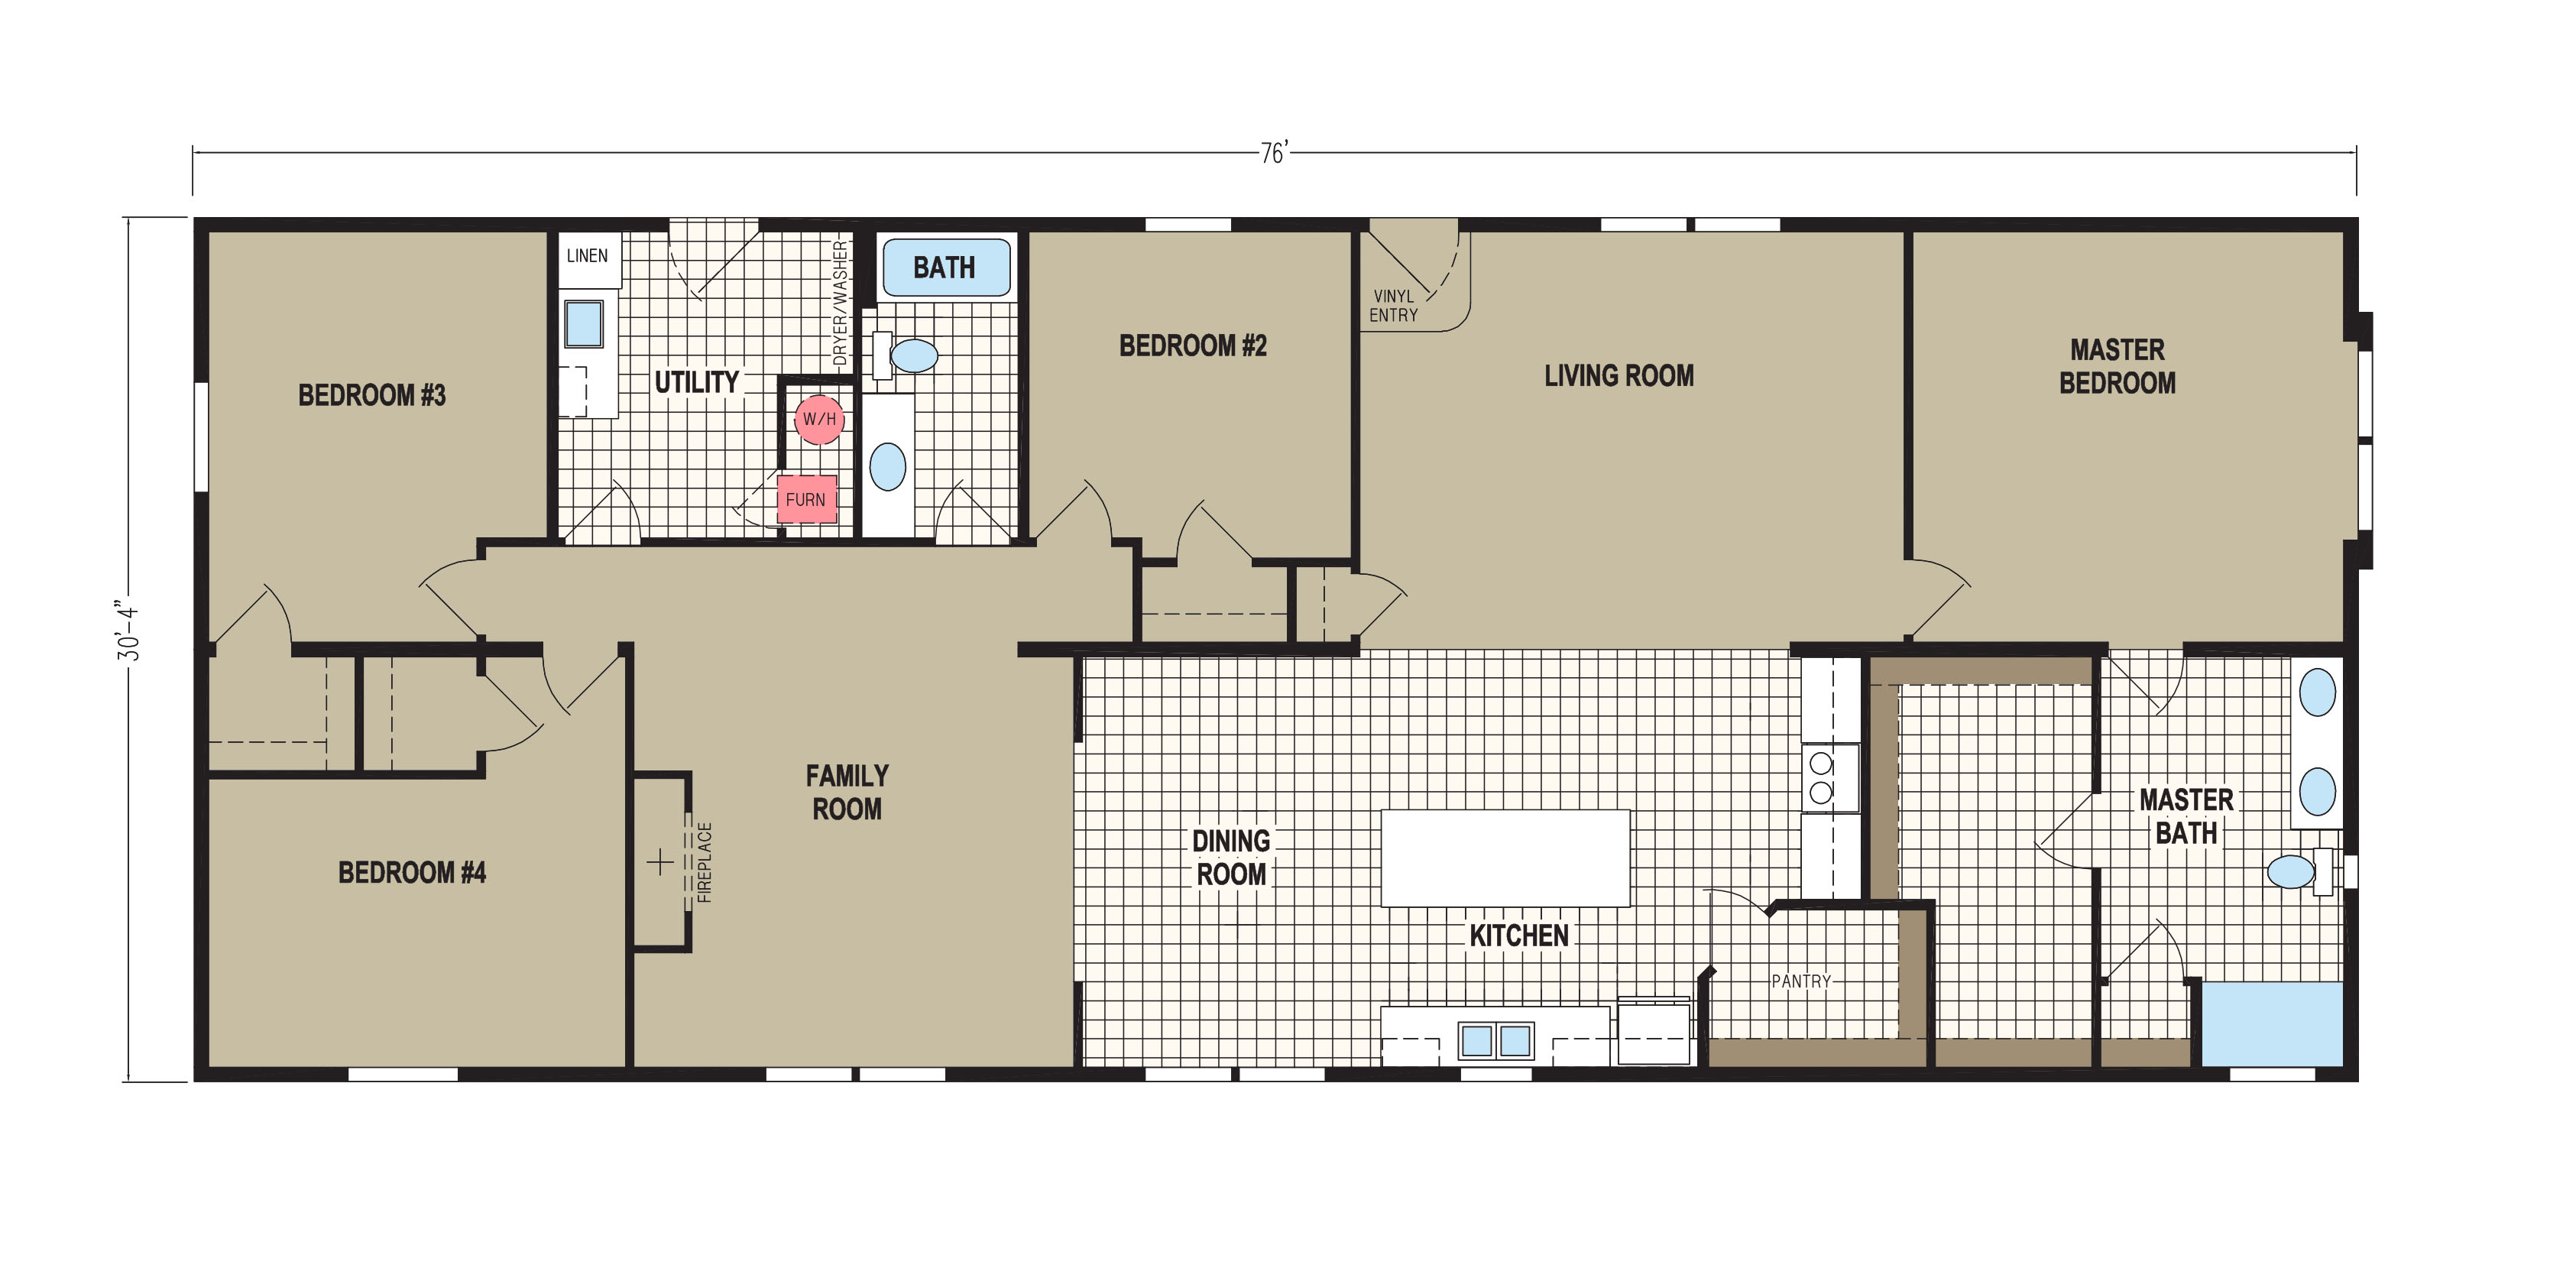 floorplan image for unit 396